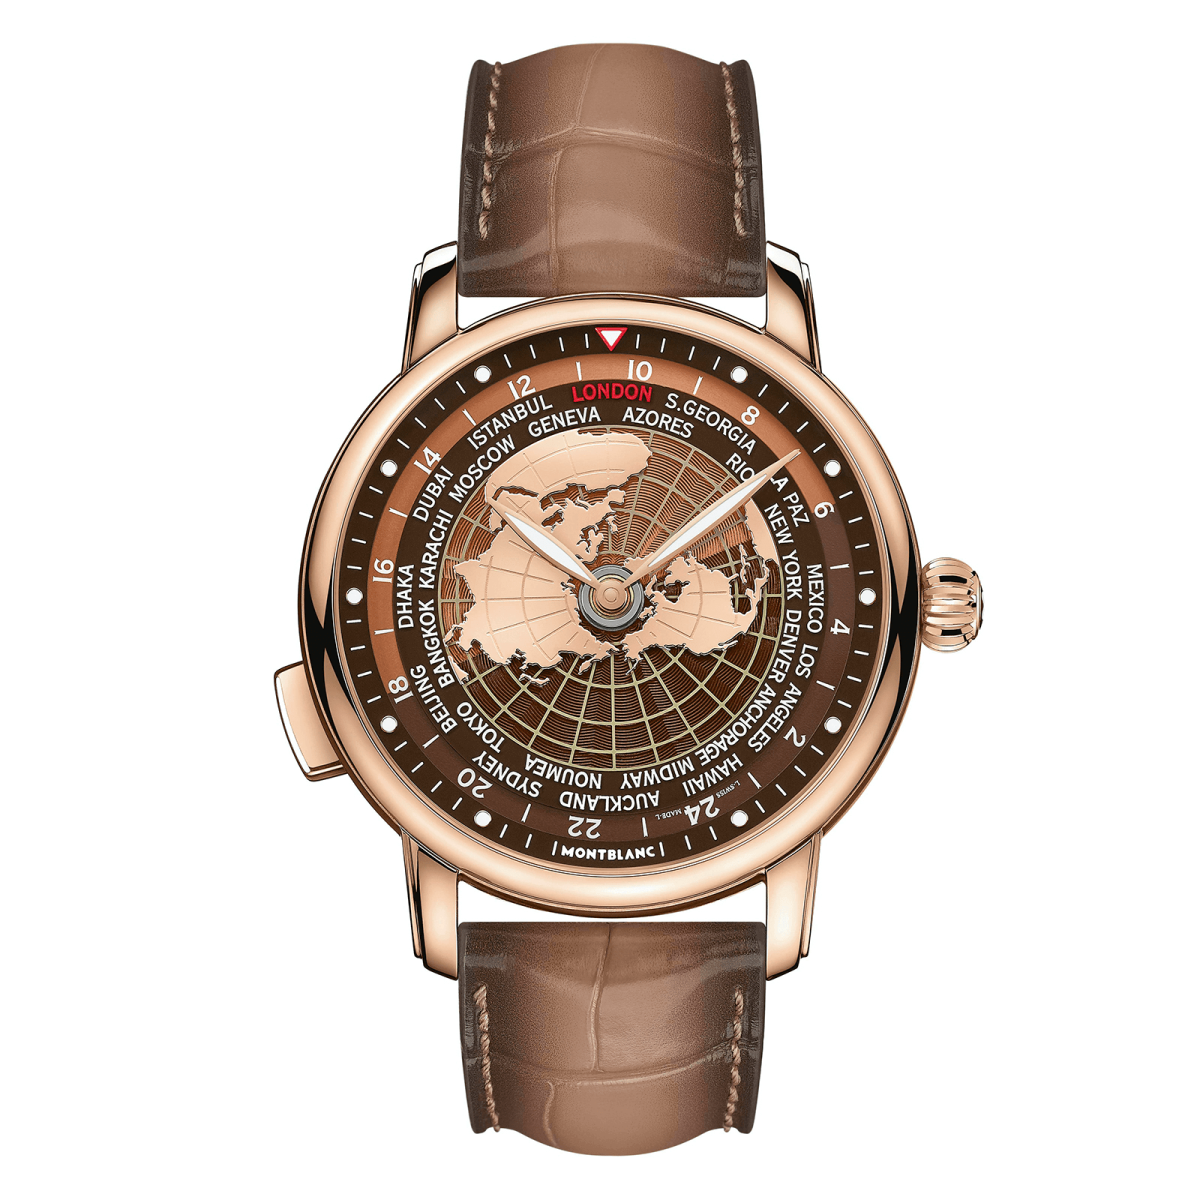 Montblanc Ra Mắt Star Legacy Orbis Terrarum Phiên Bản Limited rose-gold 2020